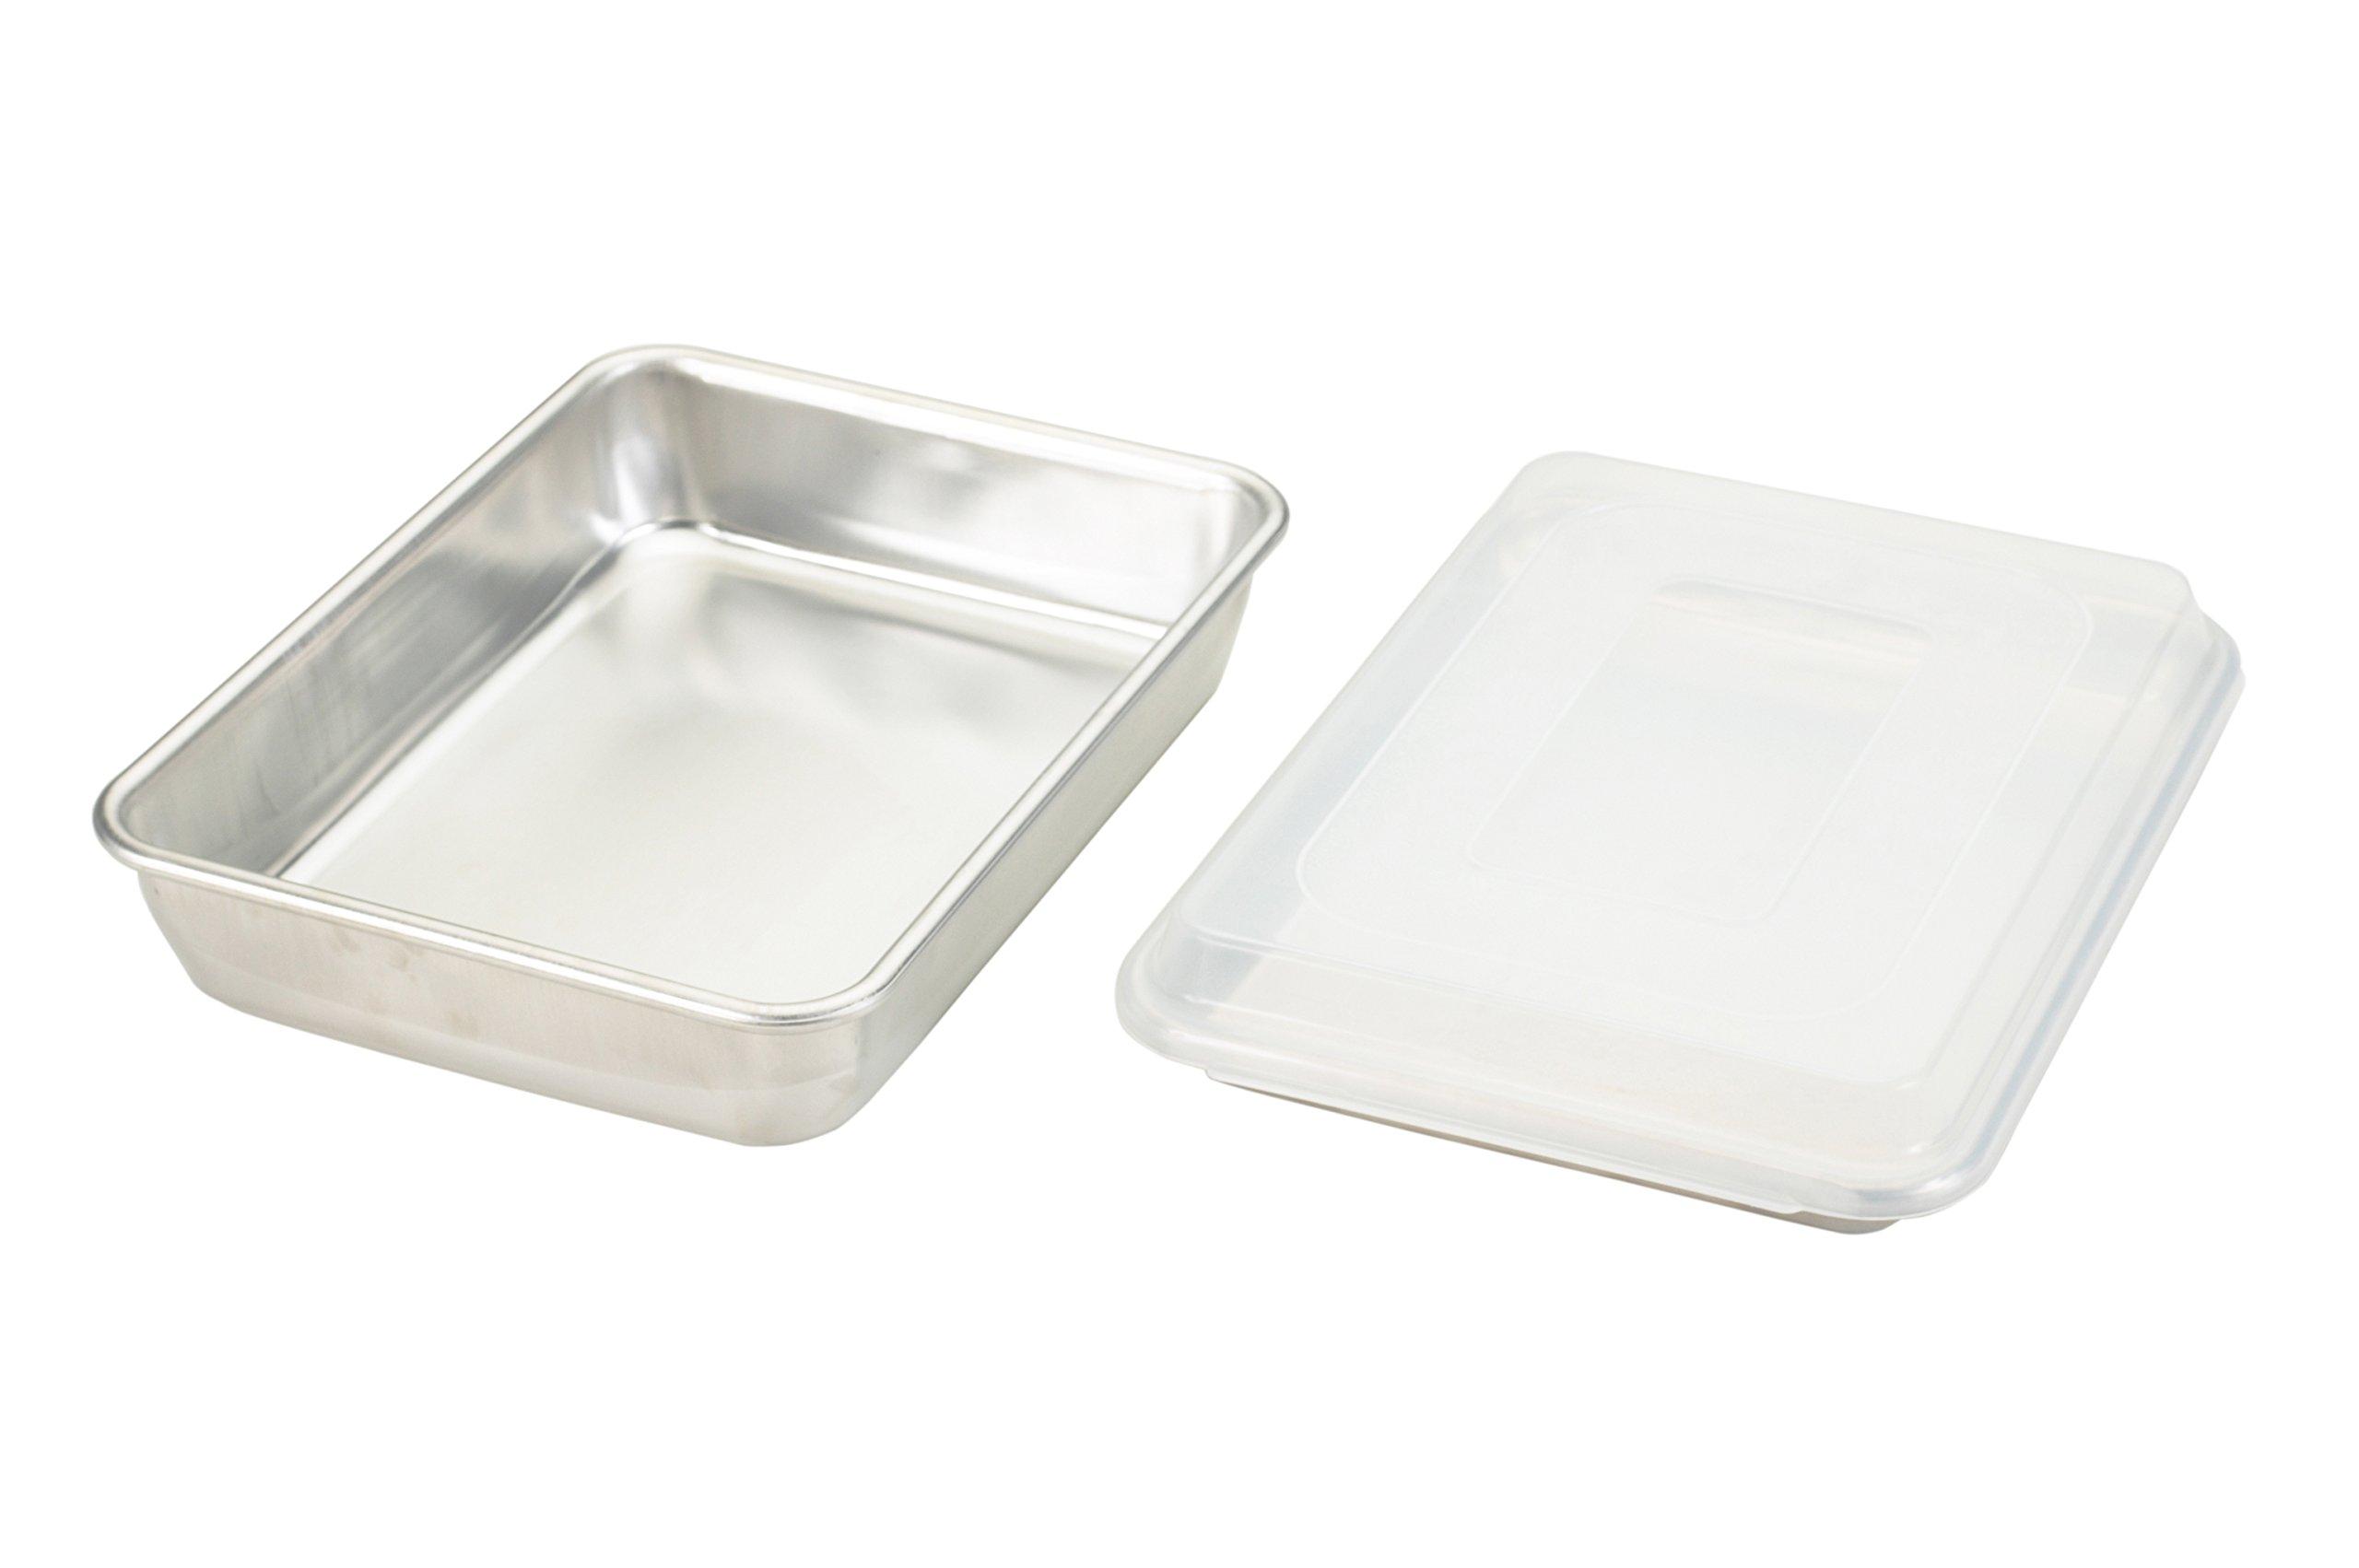 Nordic Ware Natural Aluminum Commercial 3-Piece Baker's Set, Quarter Sheet and Cake Pan